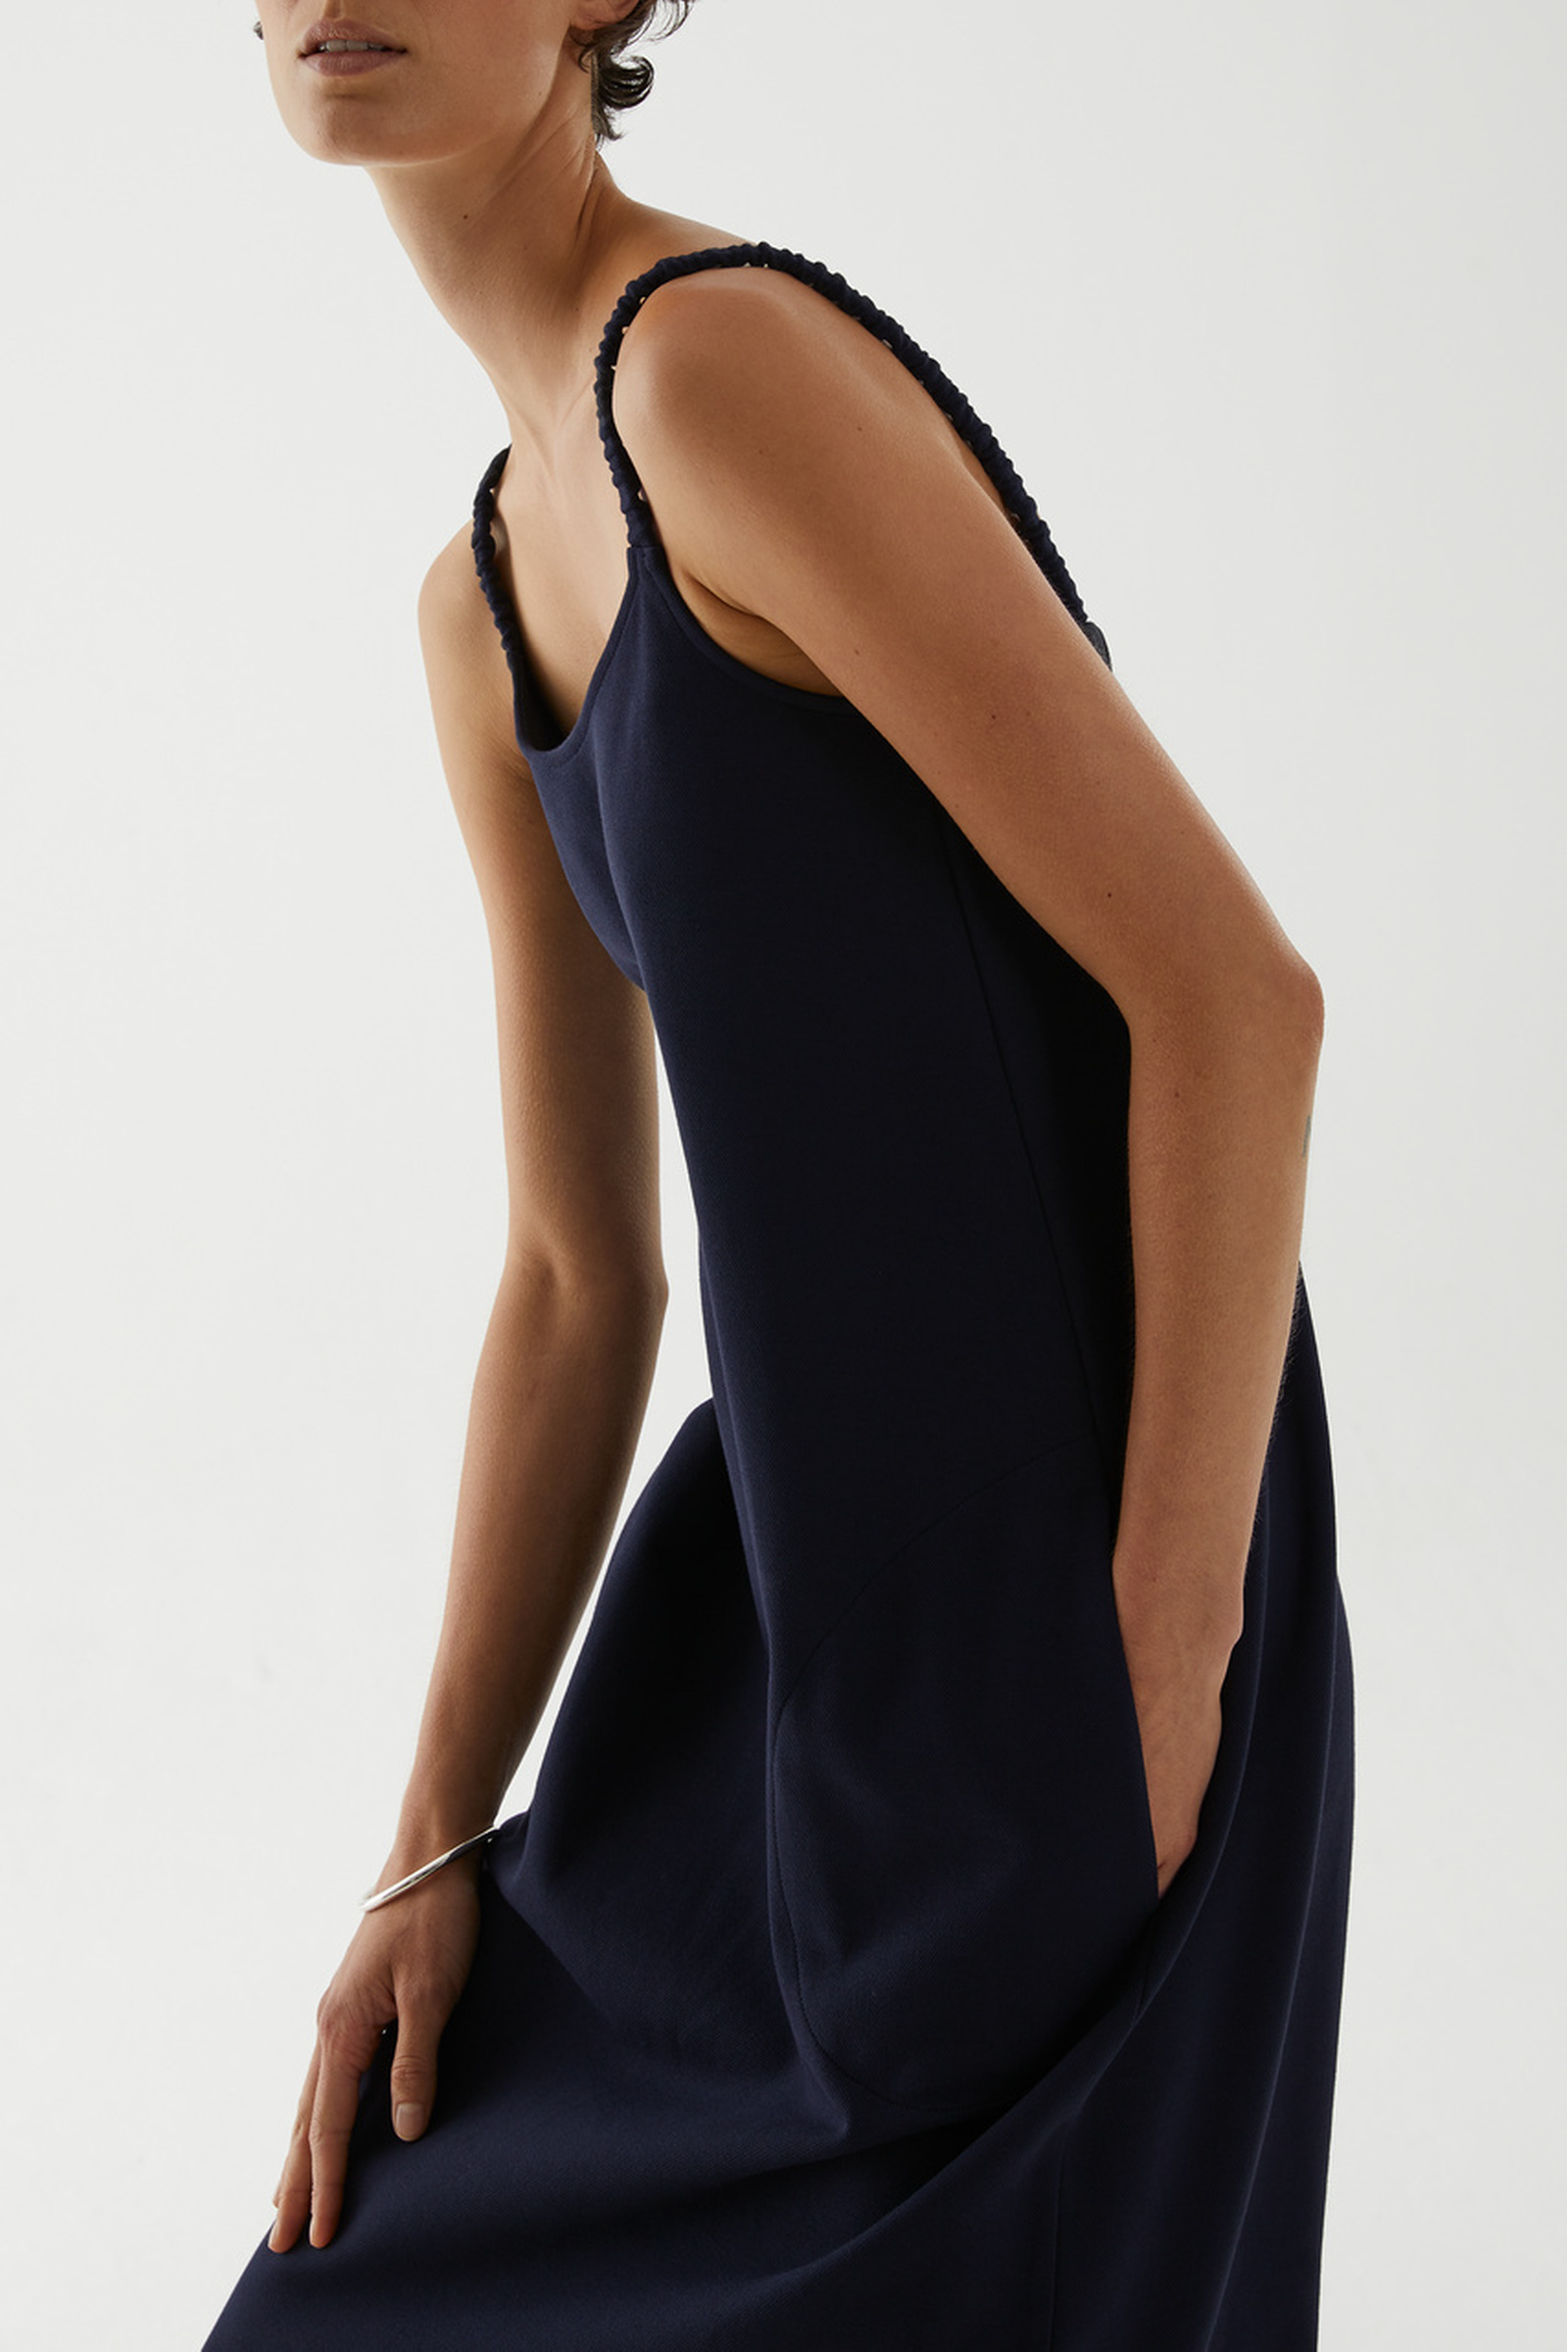 COS 오가닉 코튼 라운디드 헴 슬립 드레스의 네이비컬러 ECOMLook입니다.